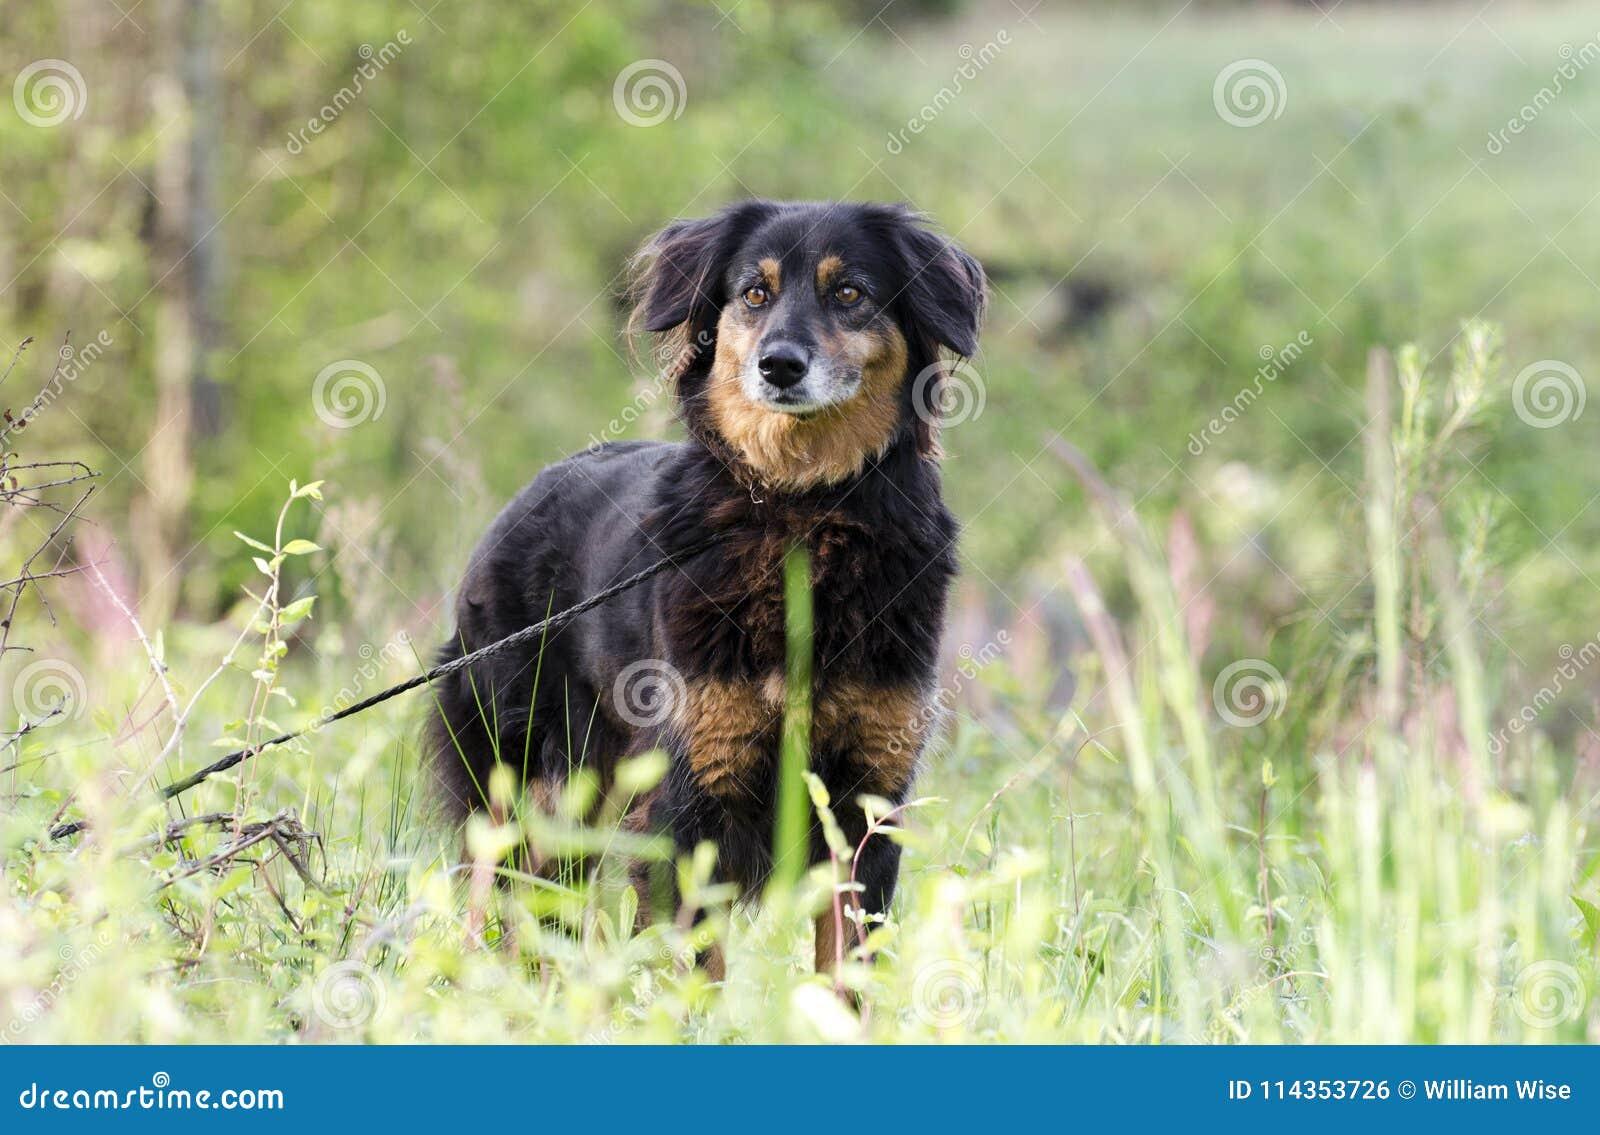 Aussie Setter Mix Dog, Pet Rescue Adoption Photography Stock